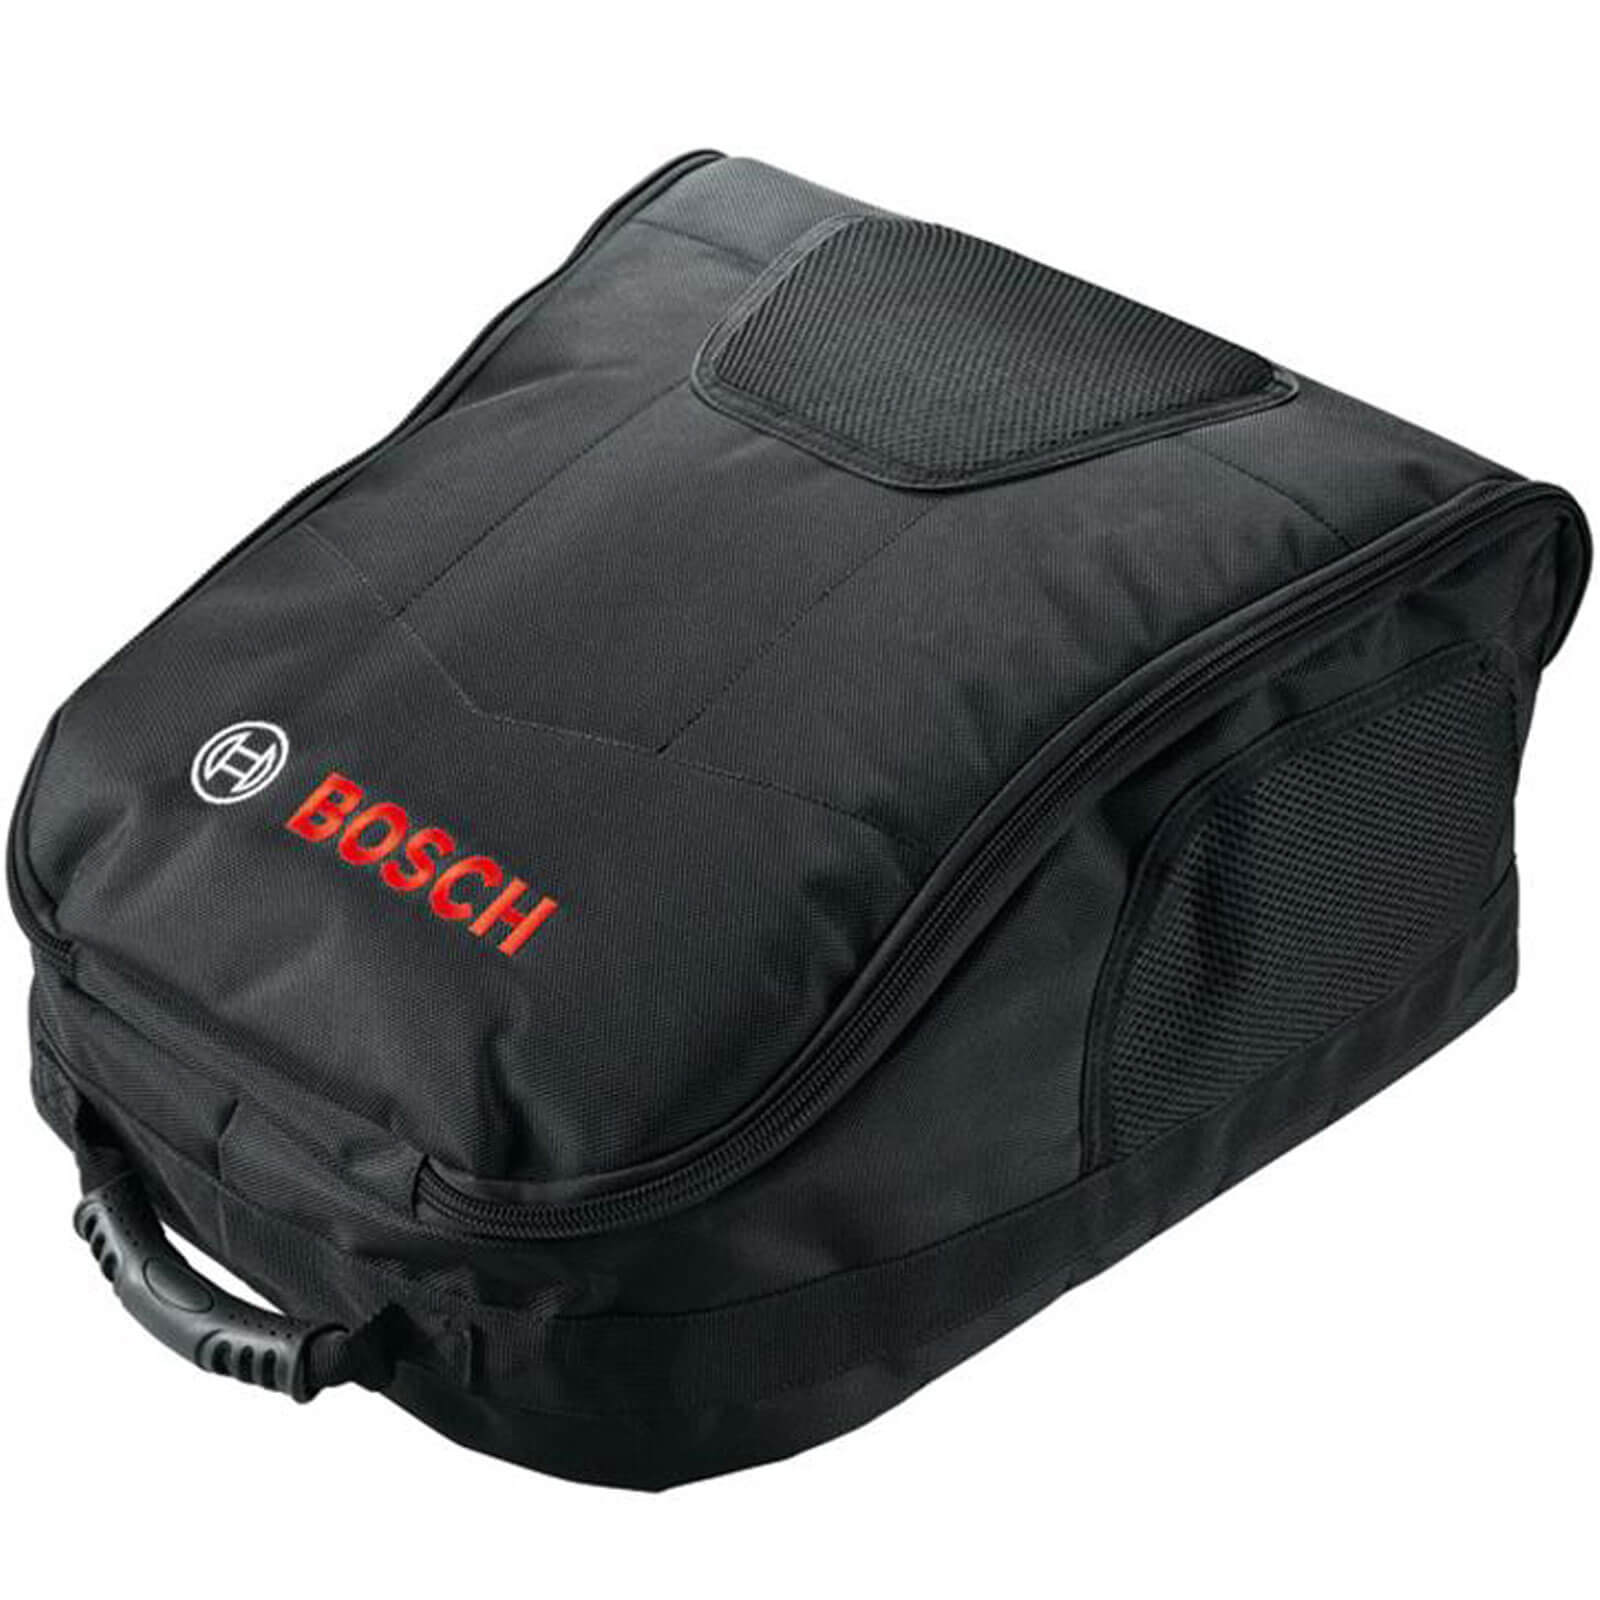 Bosch Storage Bag for Indego 350 & 450 Lawnmowers